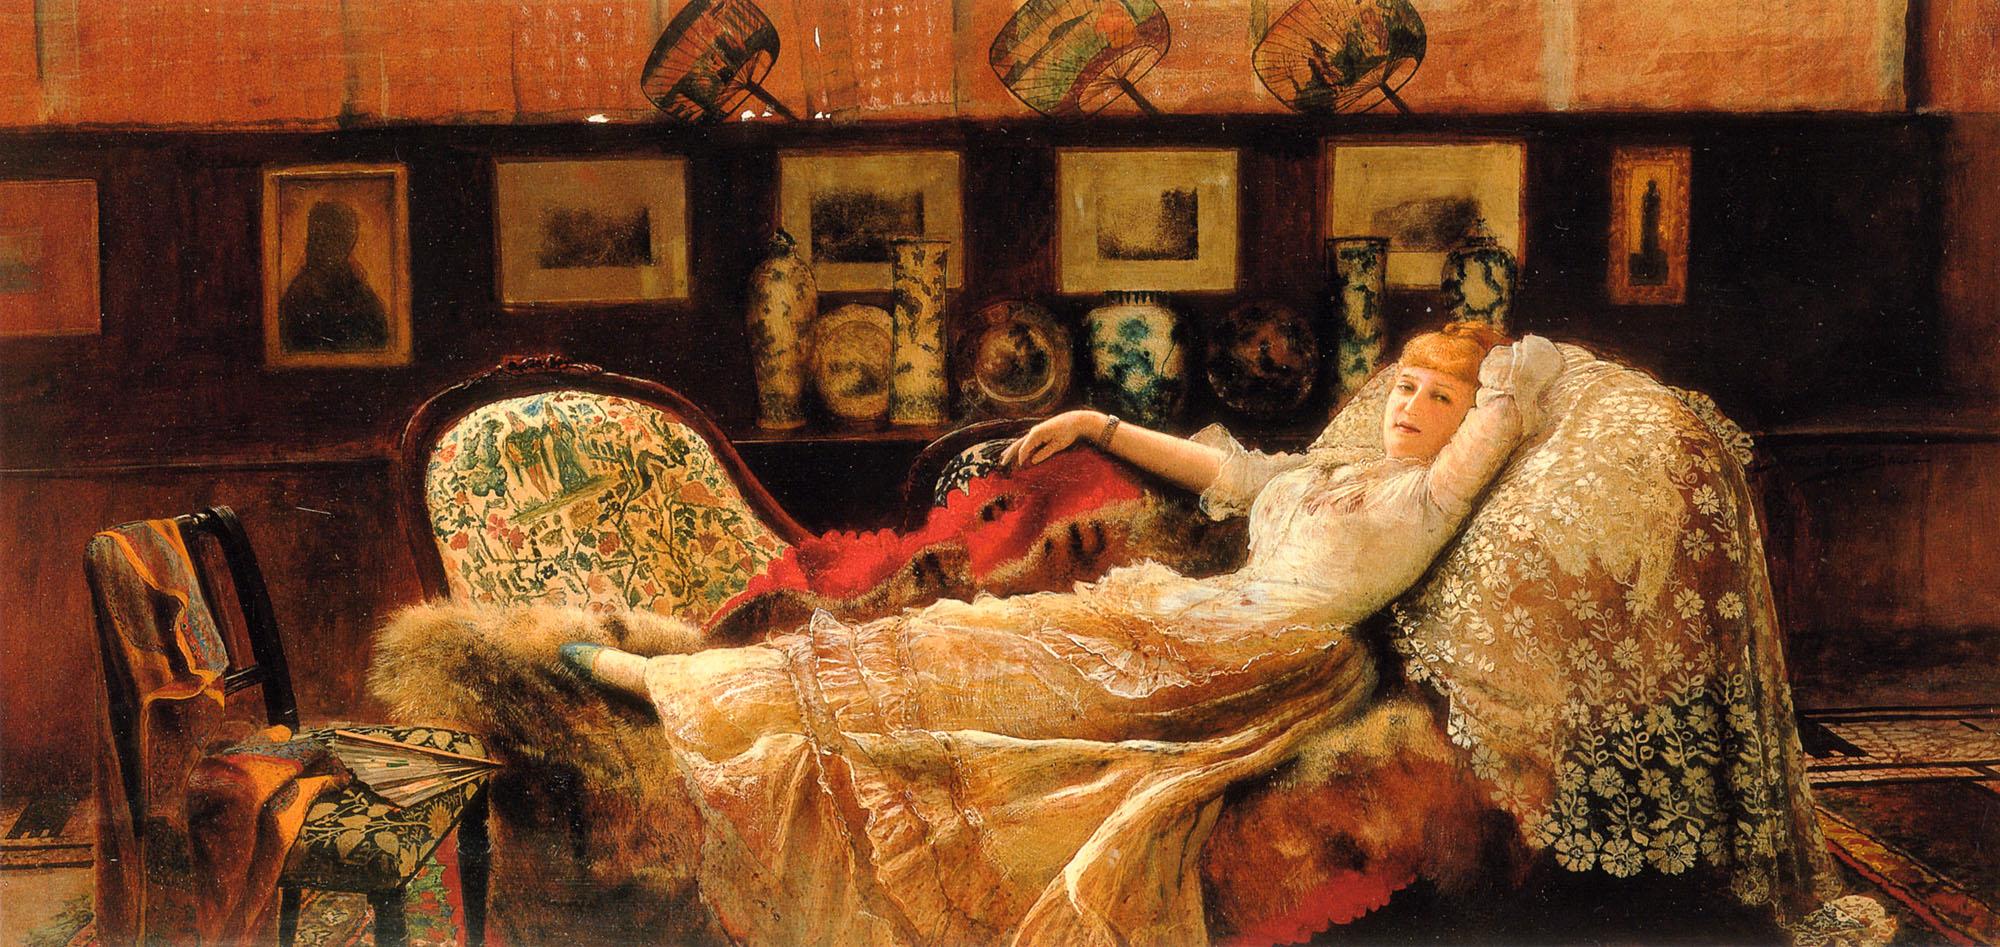 Day Dreams :: John Atkinson Grimshaw - Interiors in art and painting ôîòî